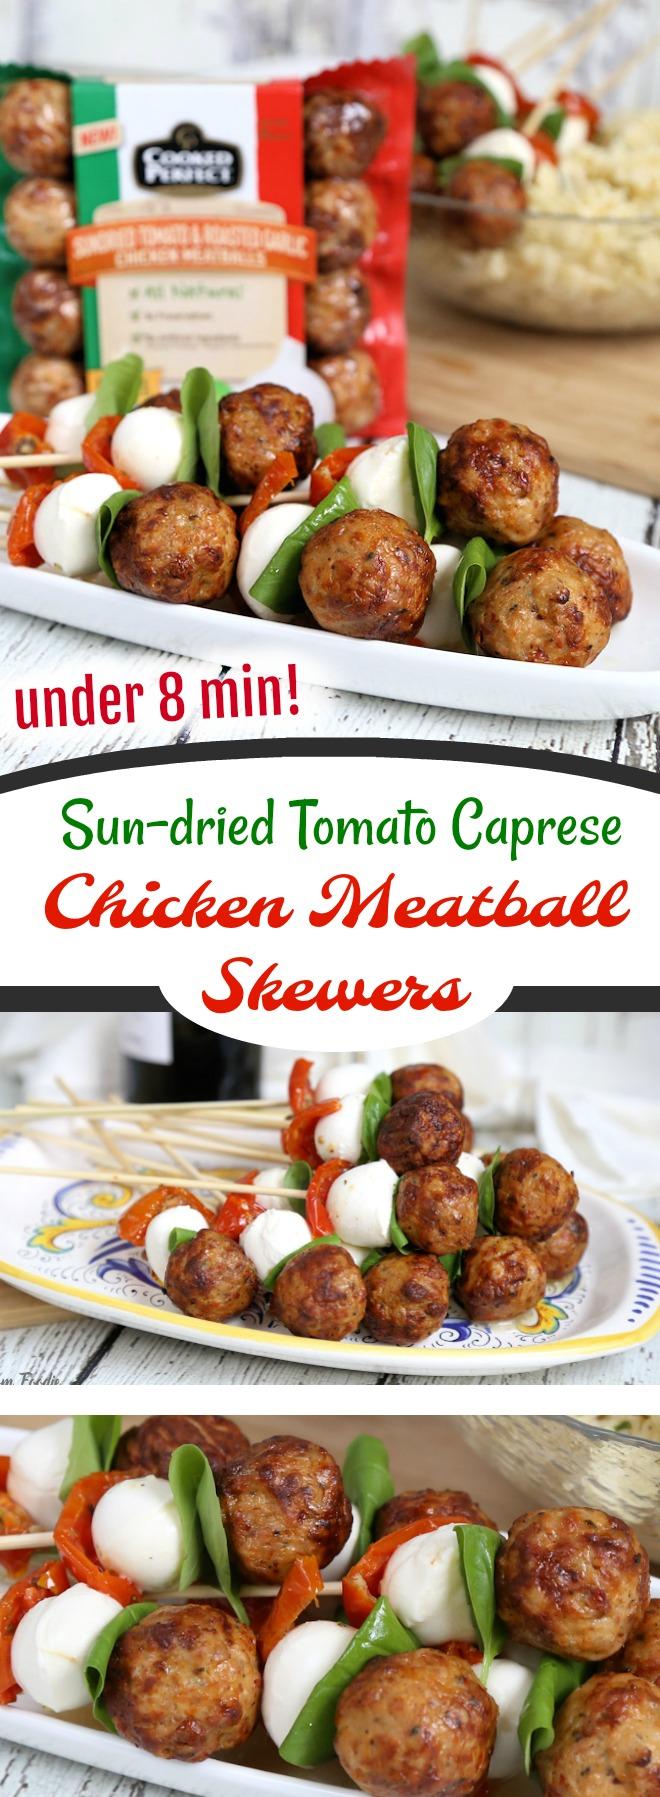 Sun-dried Tomato Caprese Meatball Skewers